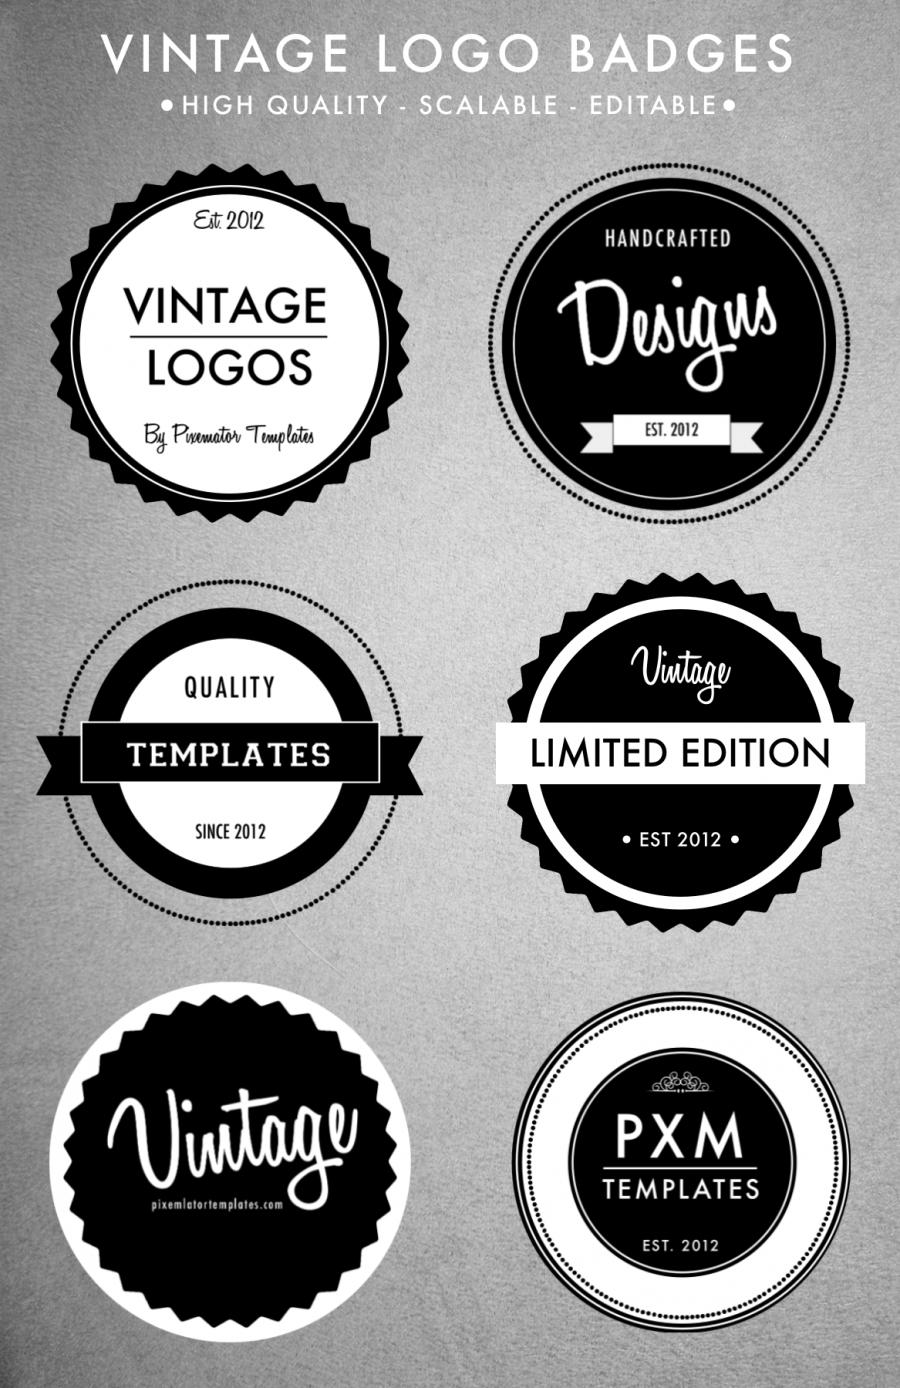 Vintage logo v10 pixelmator template 4 pixelmator vintage logo v10 pixelmator template 4 pronofoot35fo Choice Image